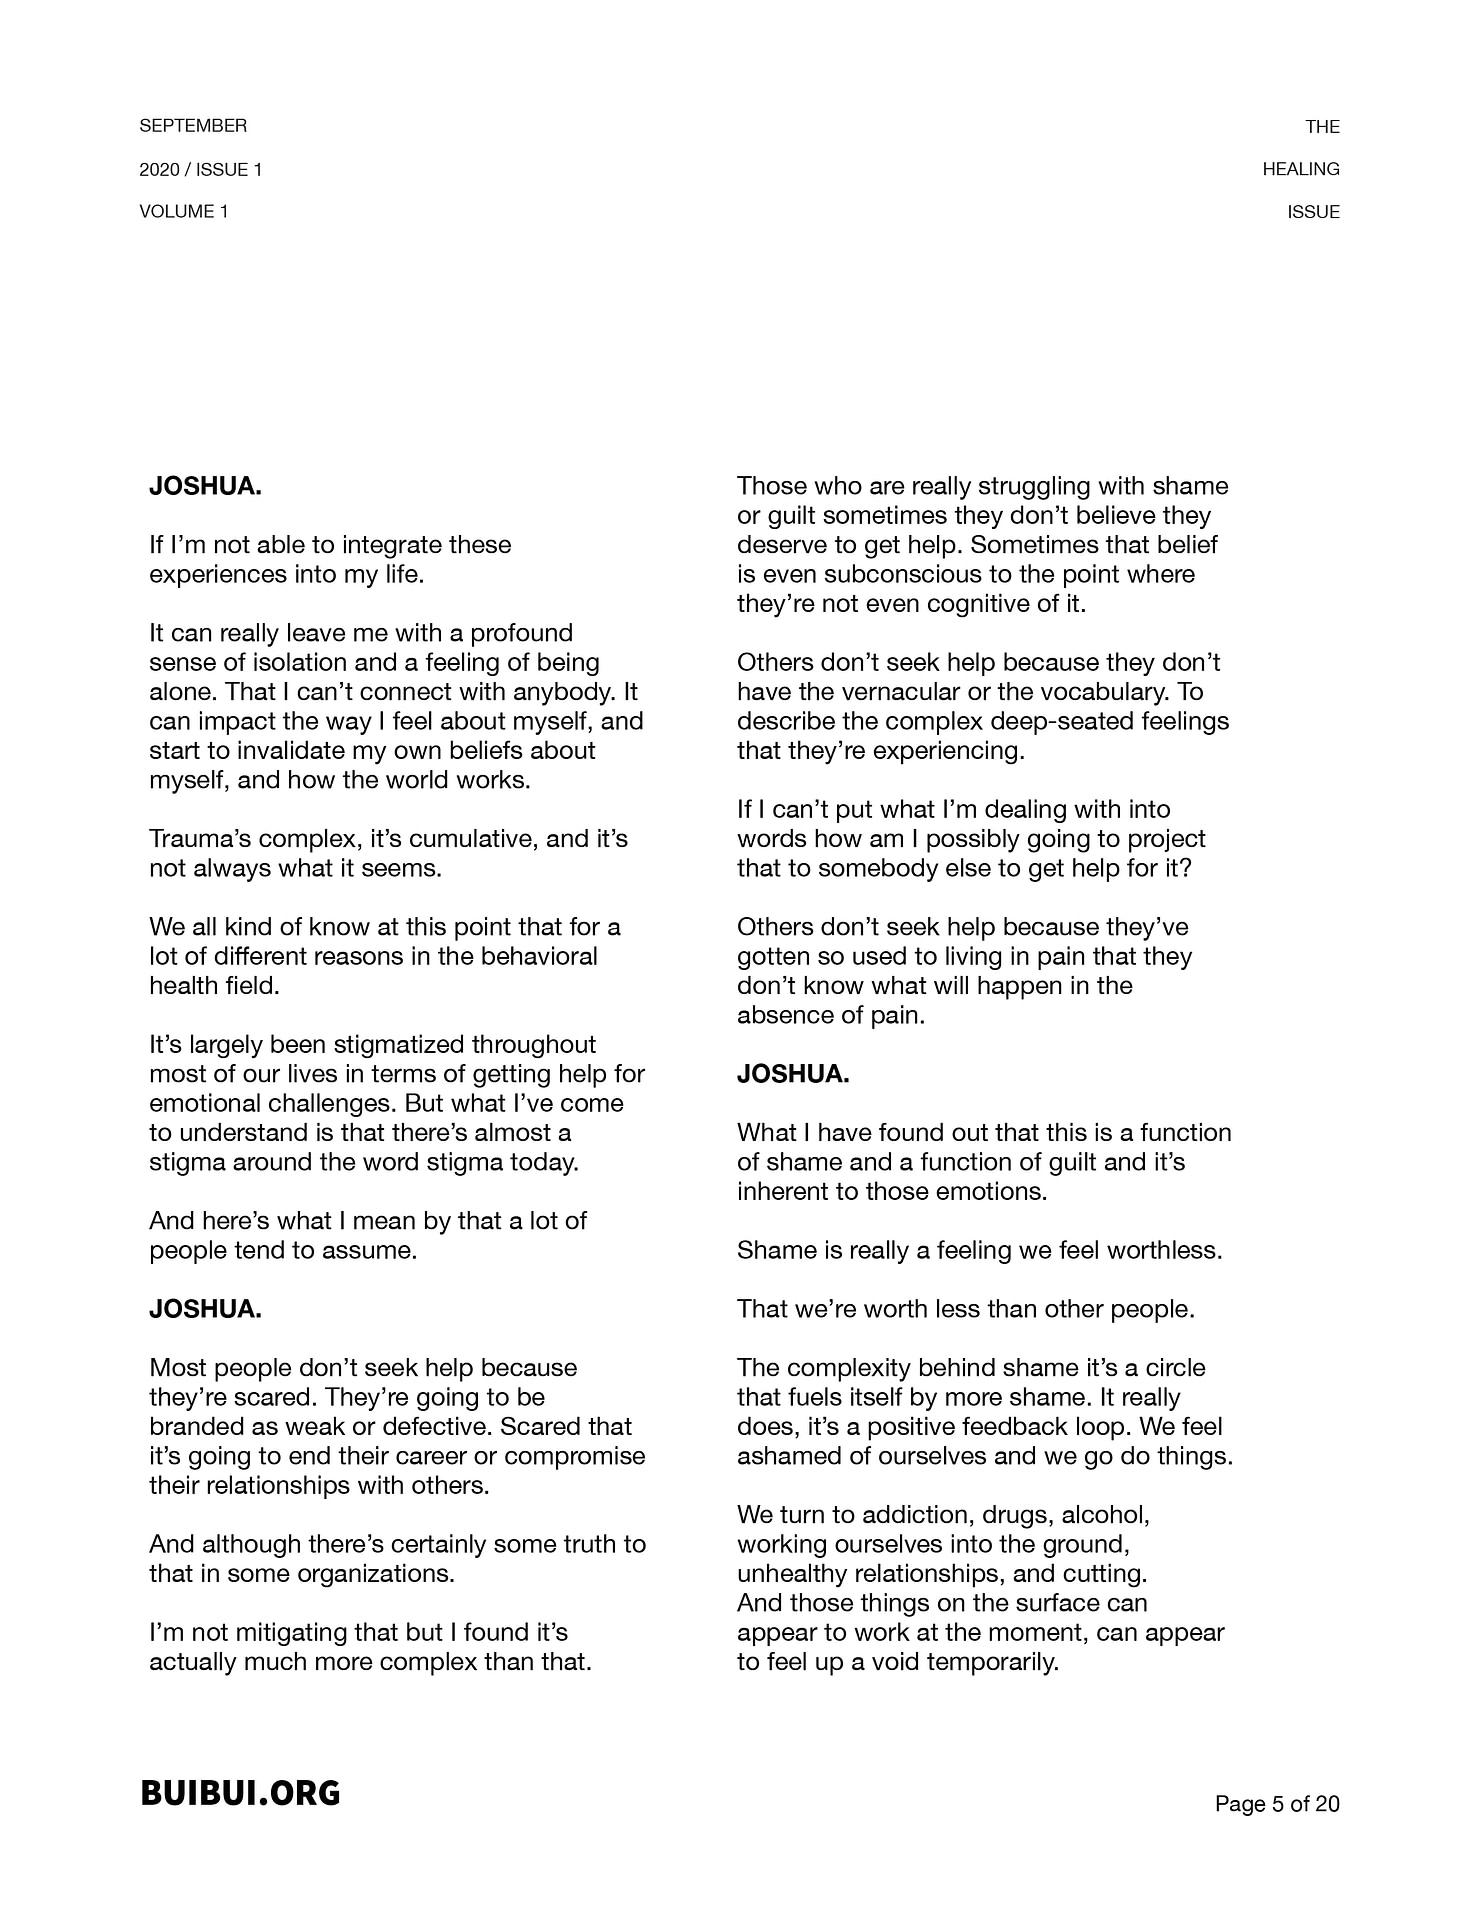 buibui-preview-02-1